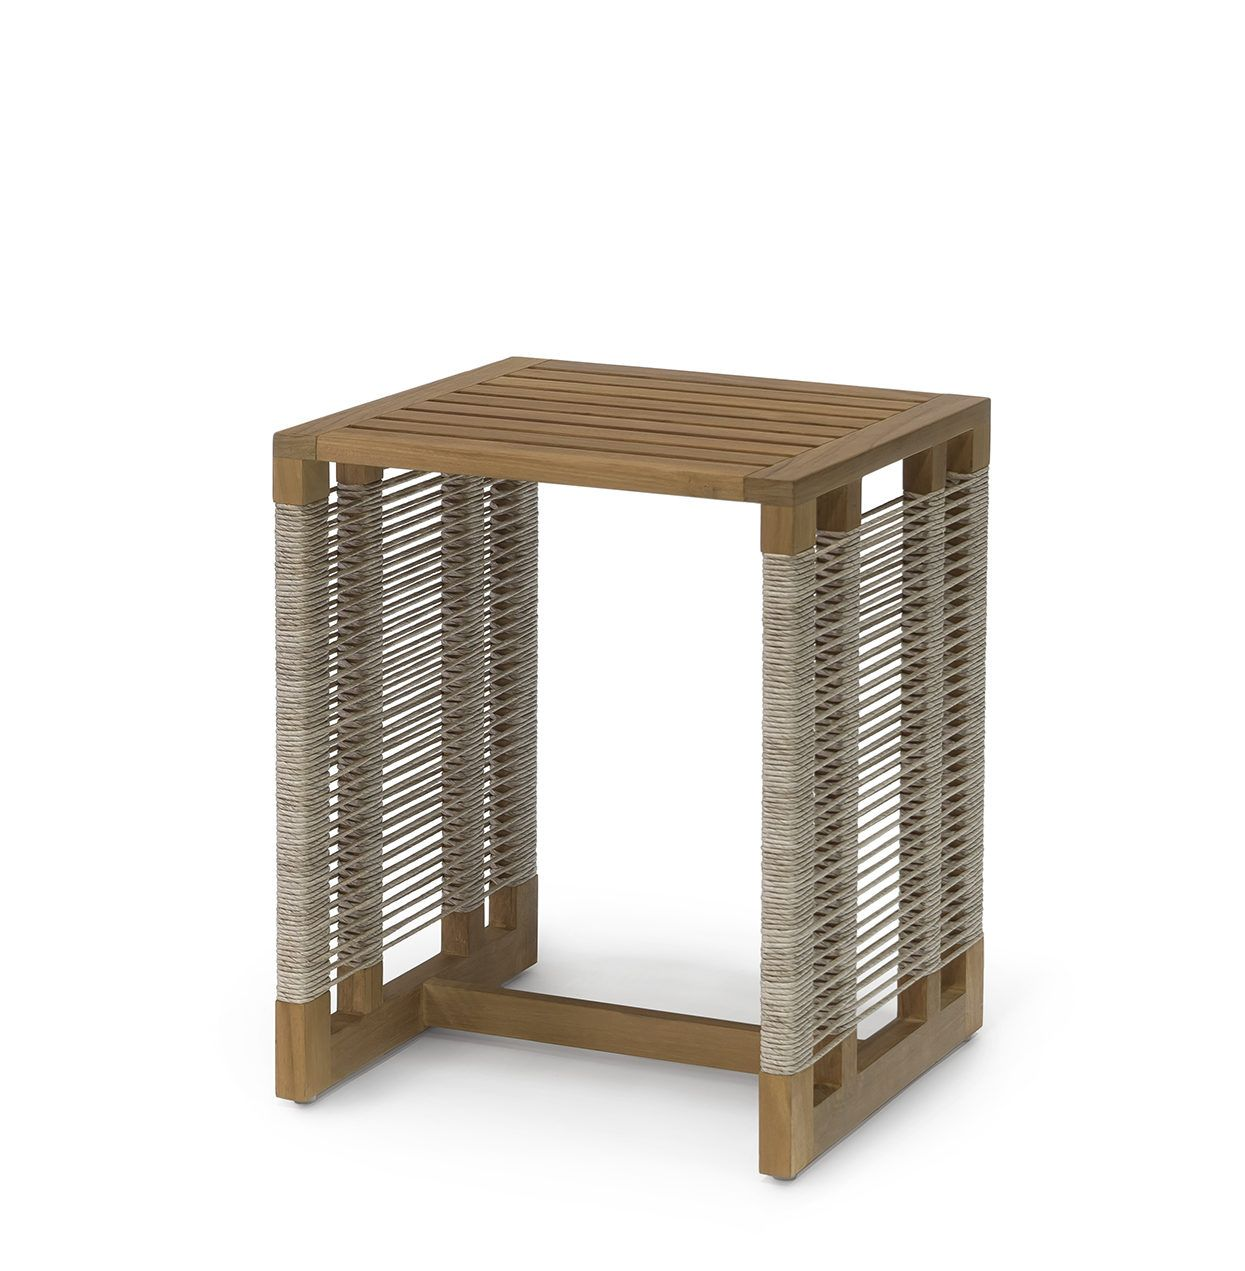 Pin de Areny Dikranian en Sculptural Furniture | Pinterest